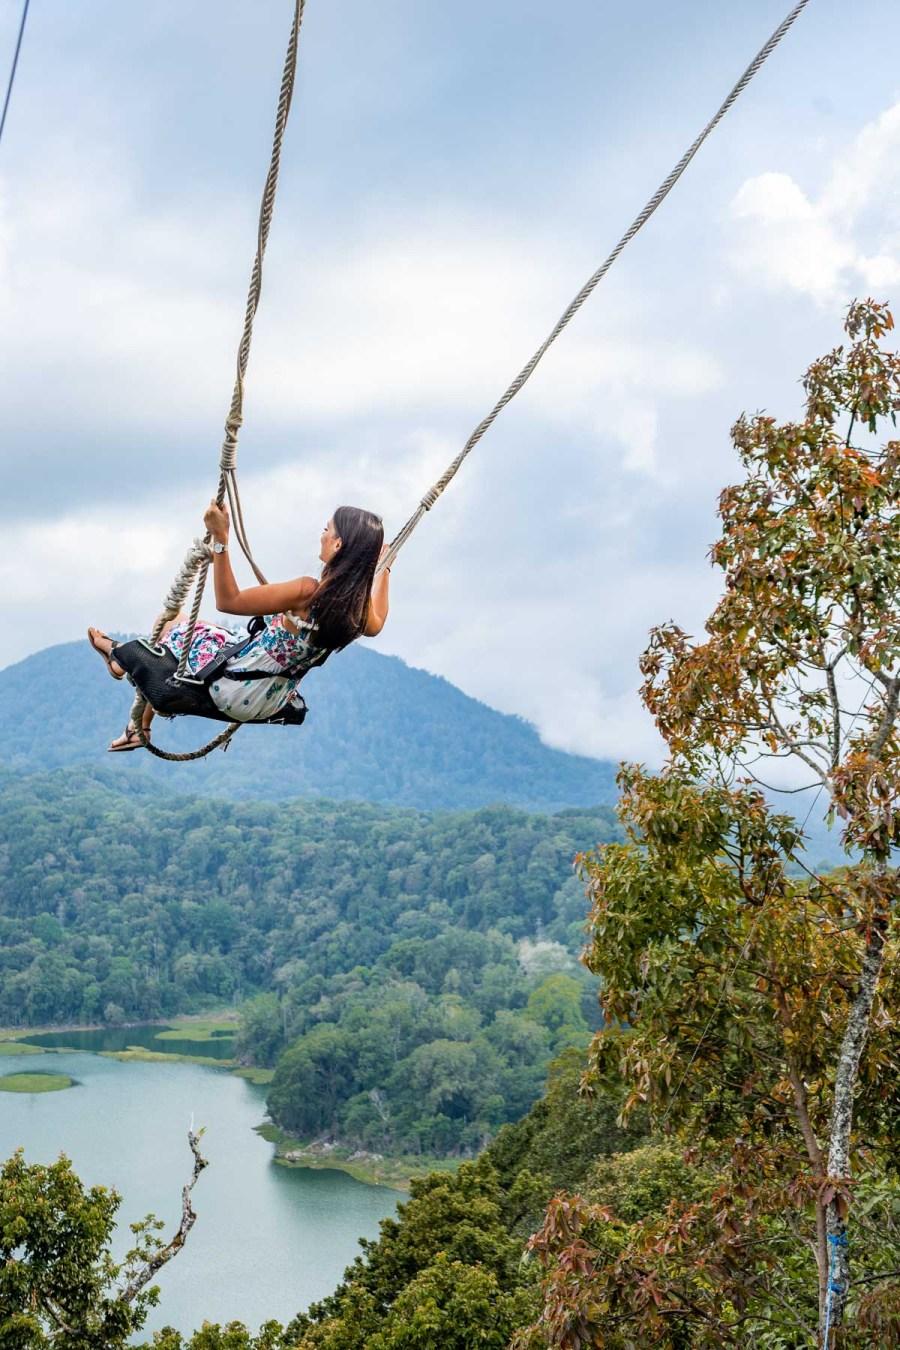 Girl swinging at Wanagiri Hidden Hills in Bali